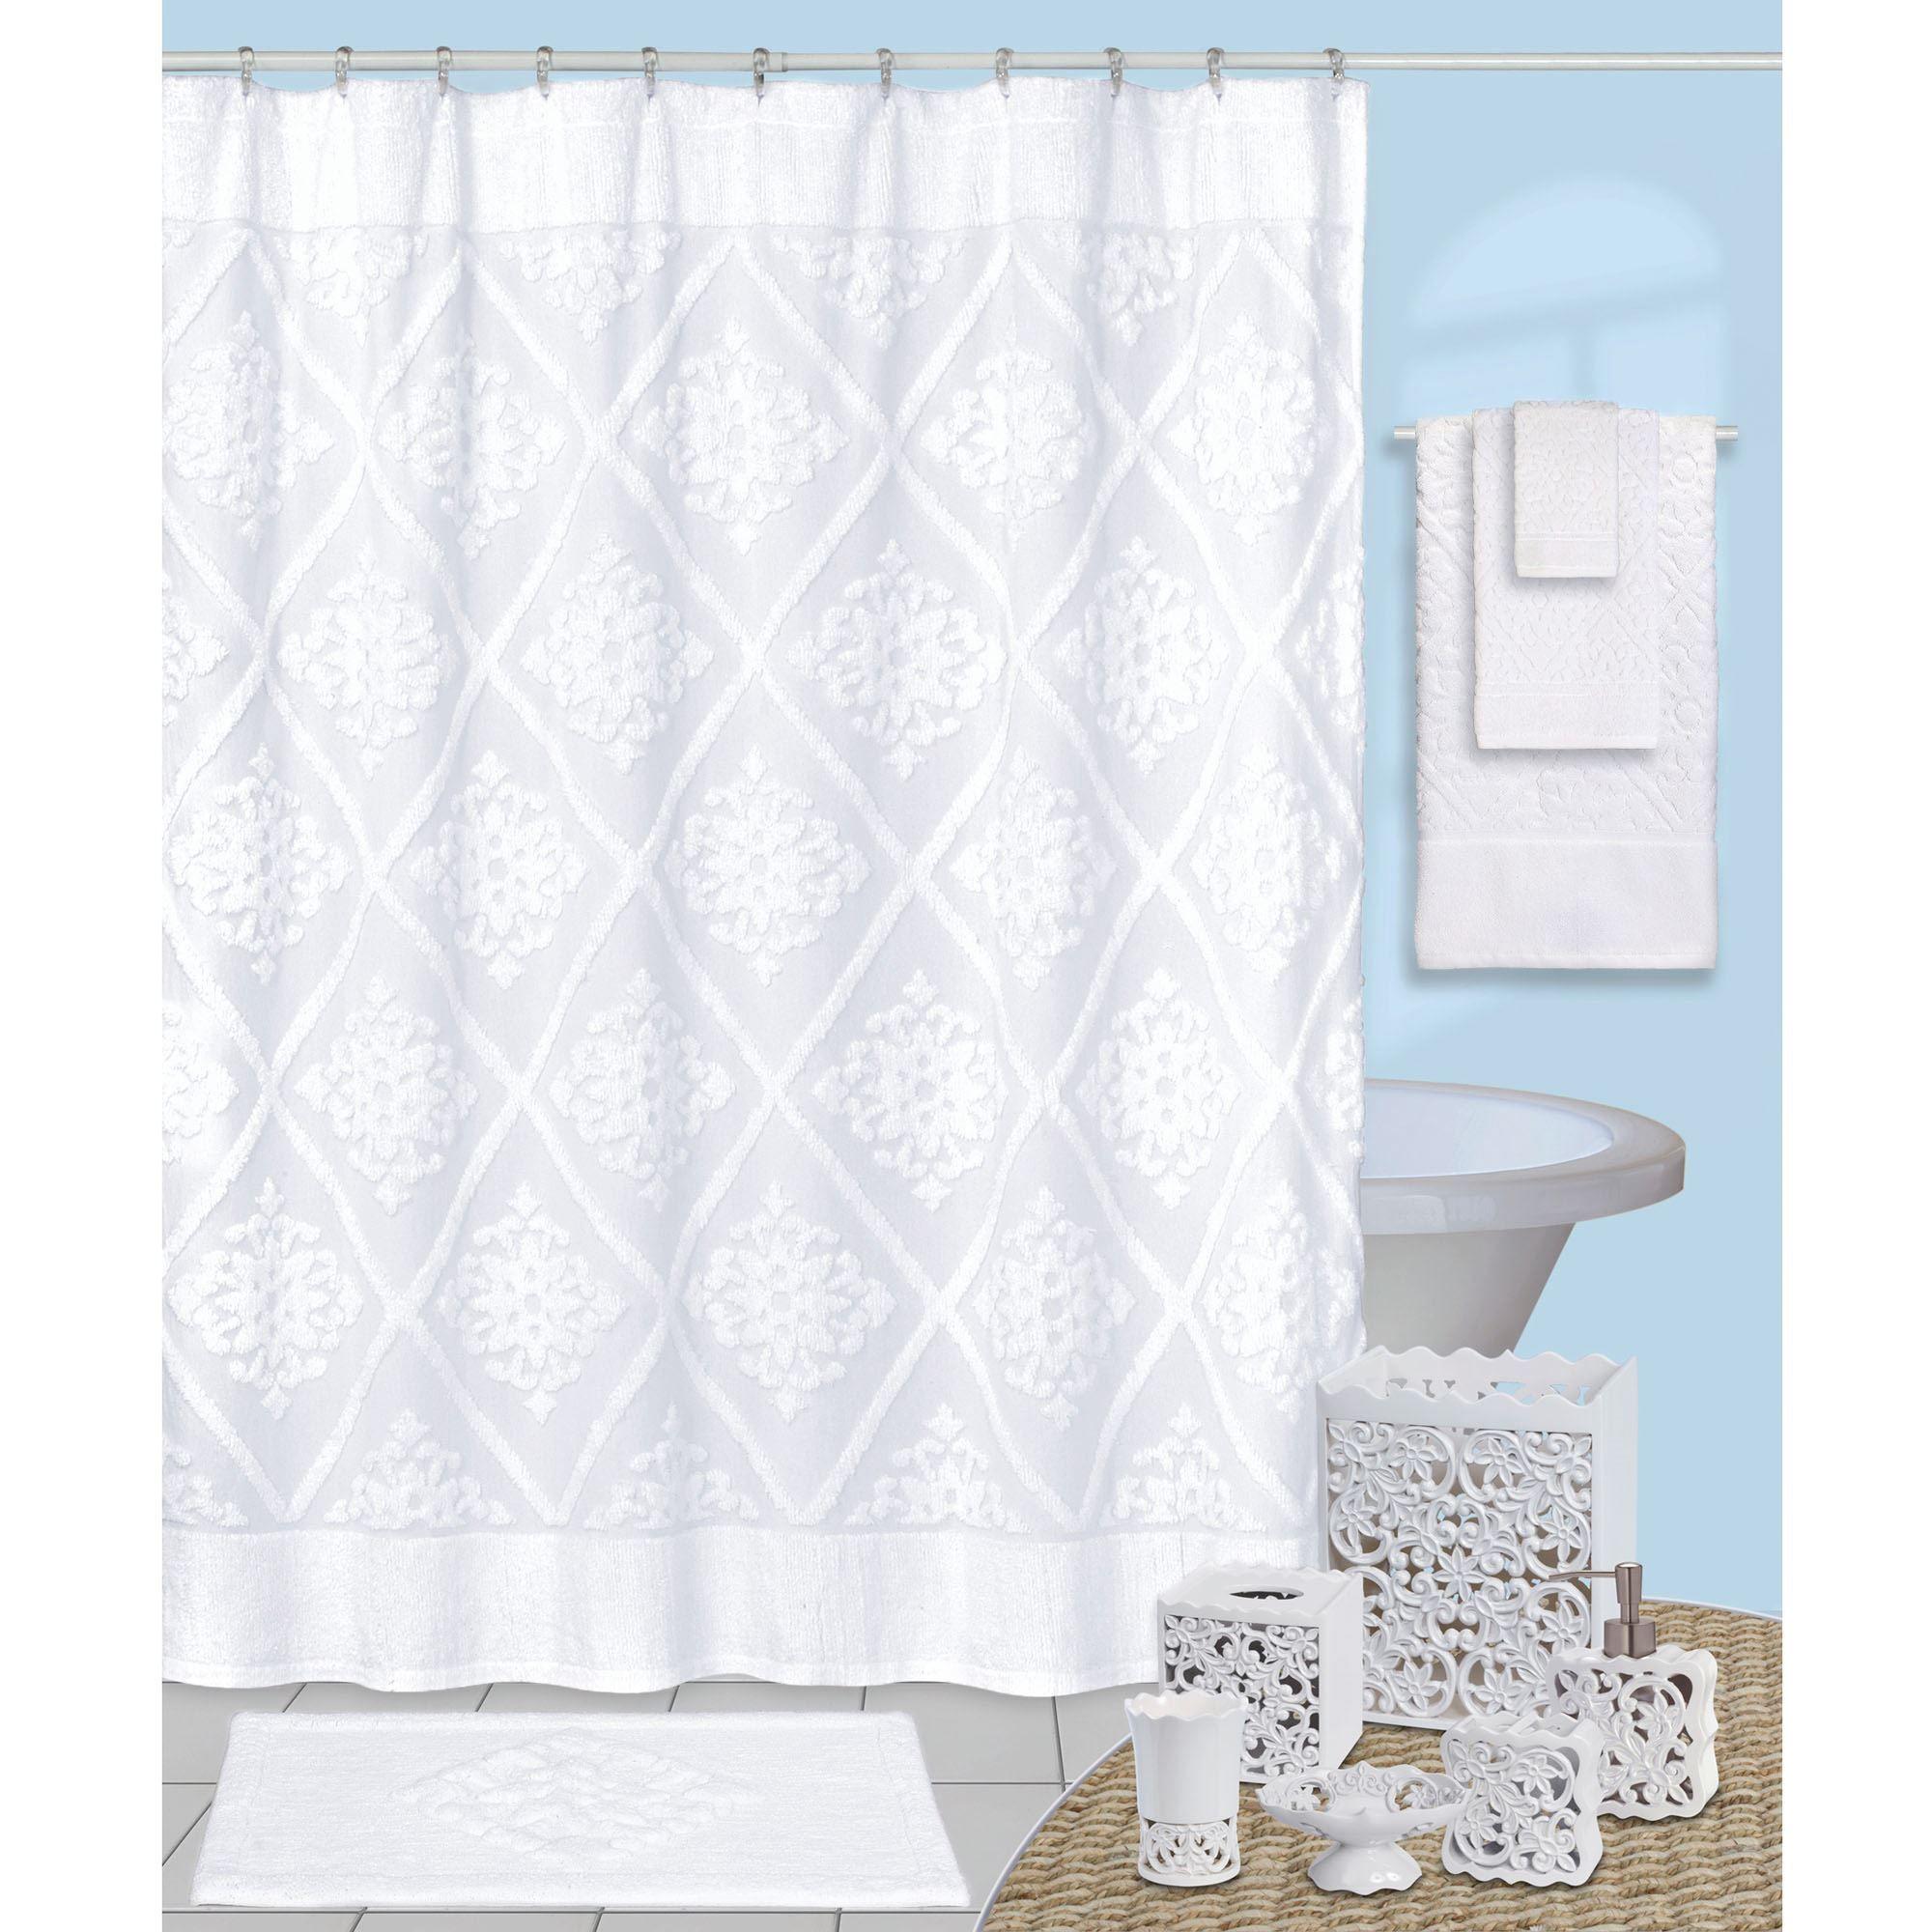 Belle Shower Curtain White 72 X 72